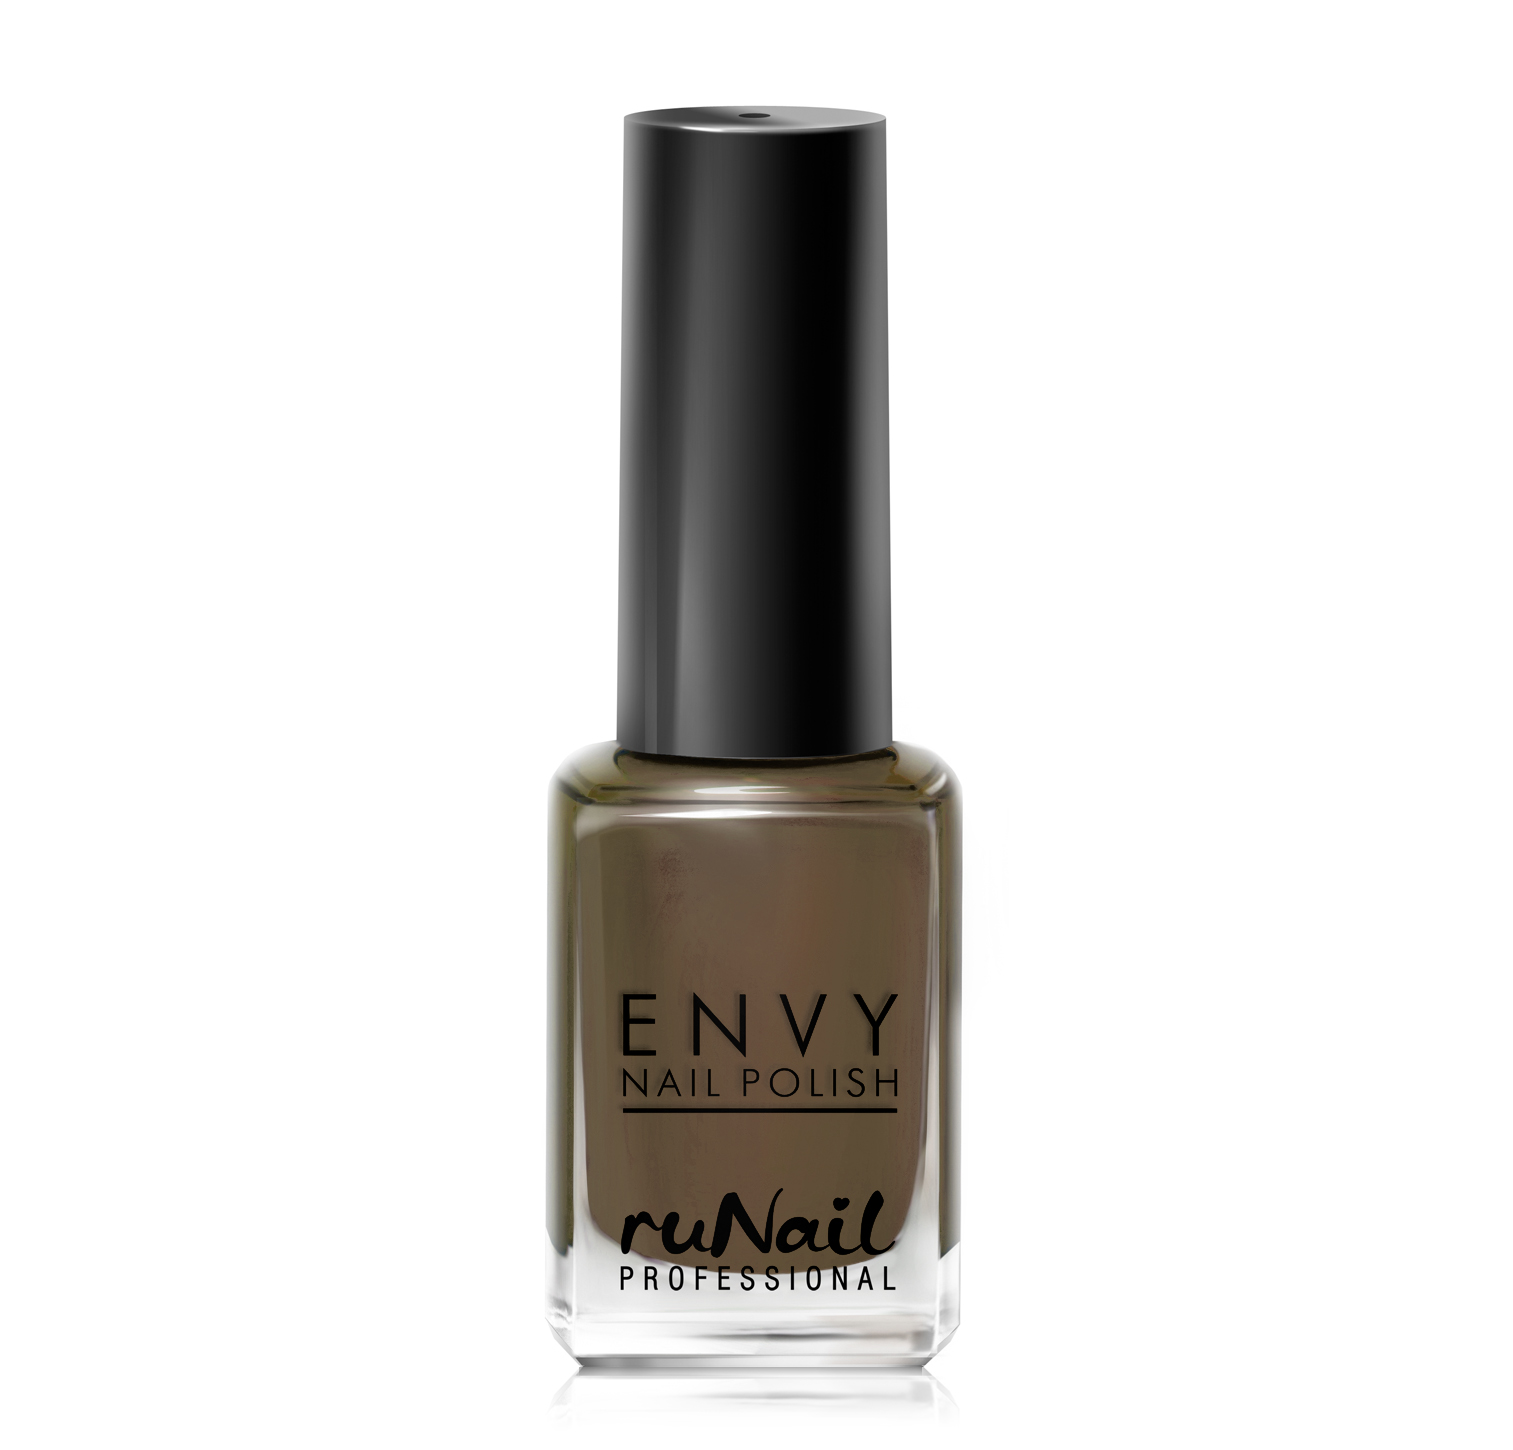 Лак для ногтей Envy, 12 мл, №1549, цвет: Гляссе №1549